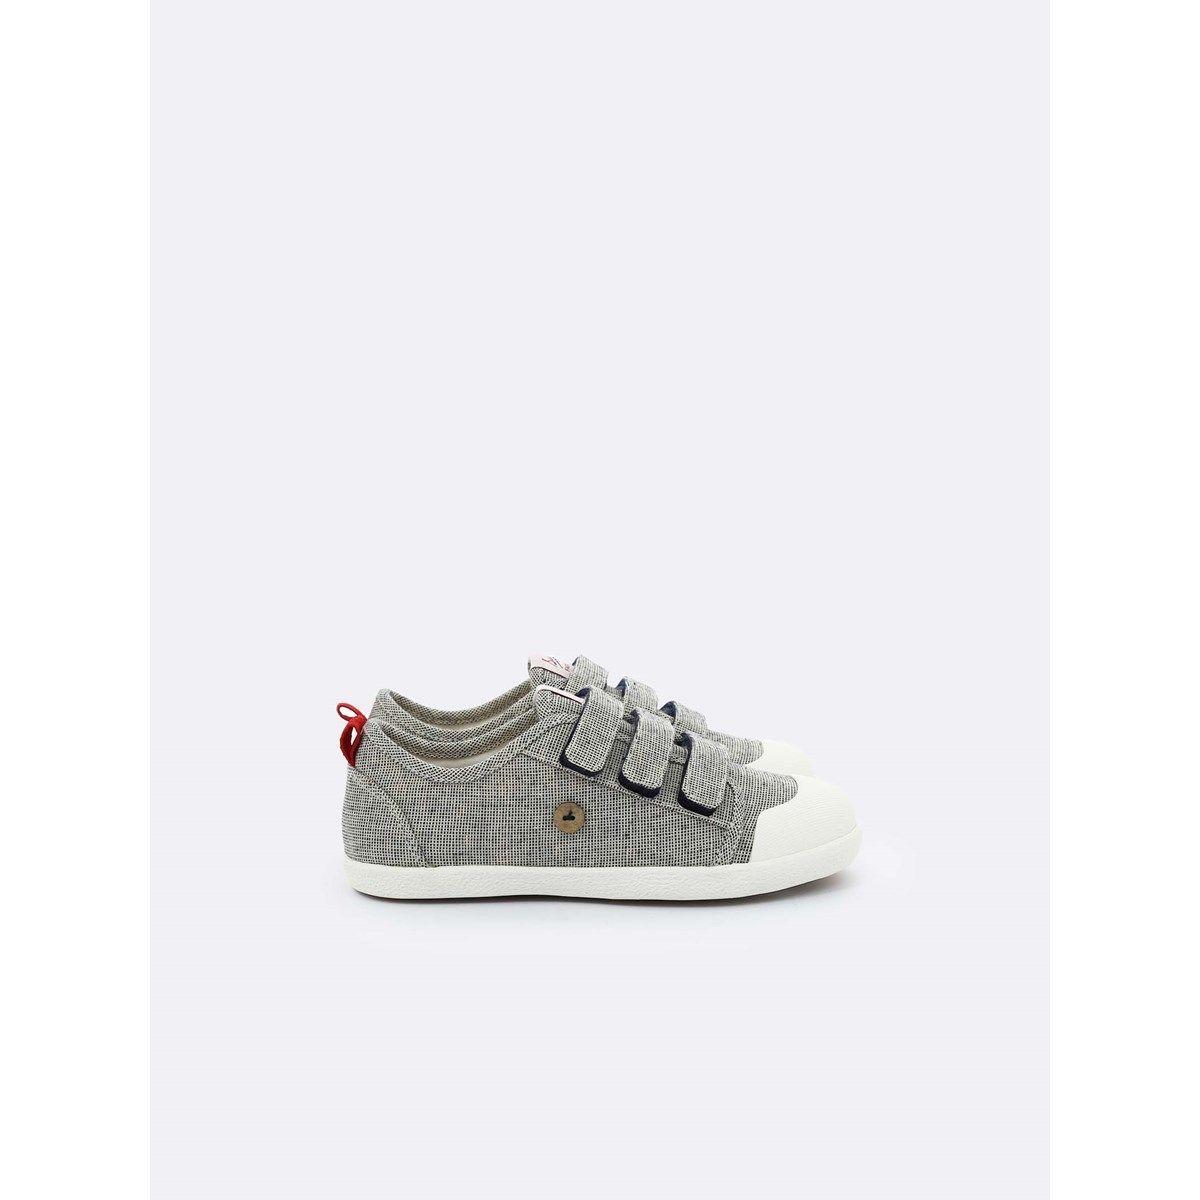 chaussure toile garcon 24 converse